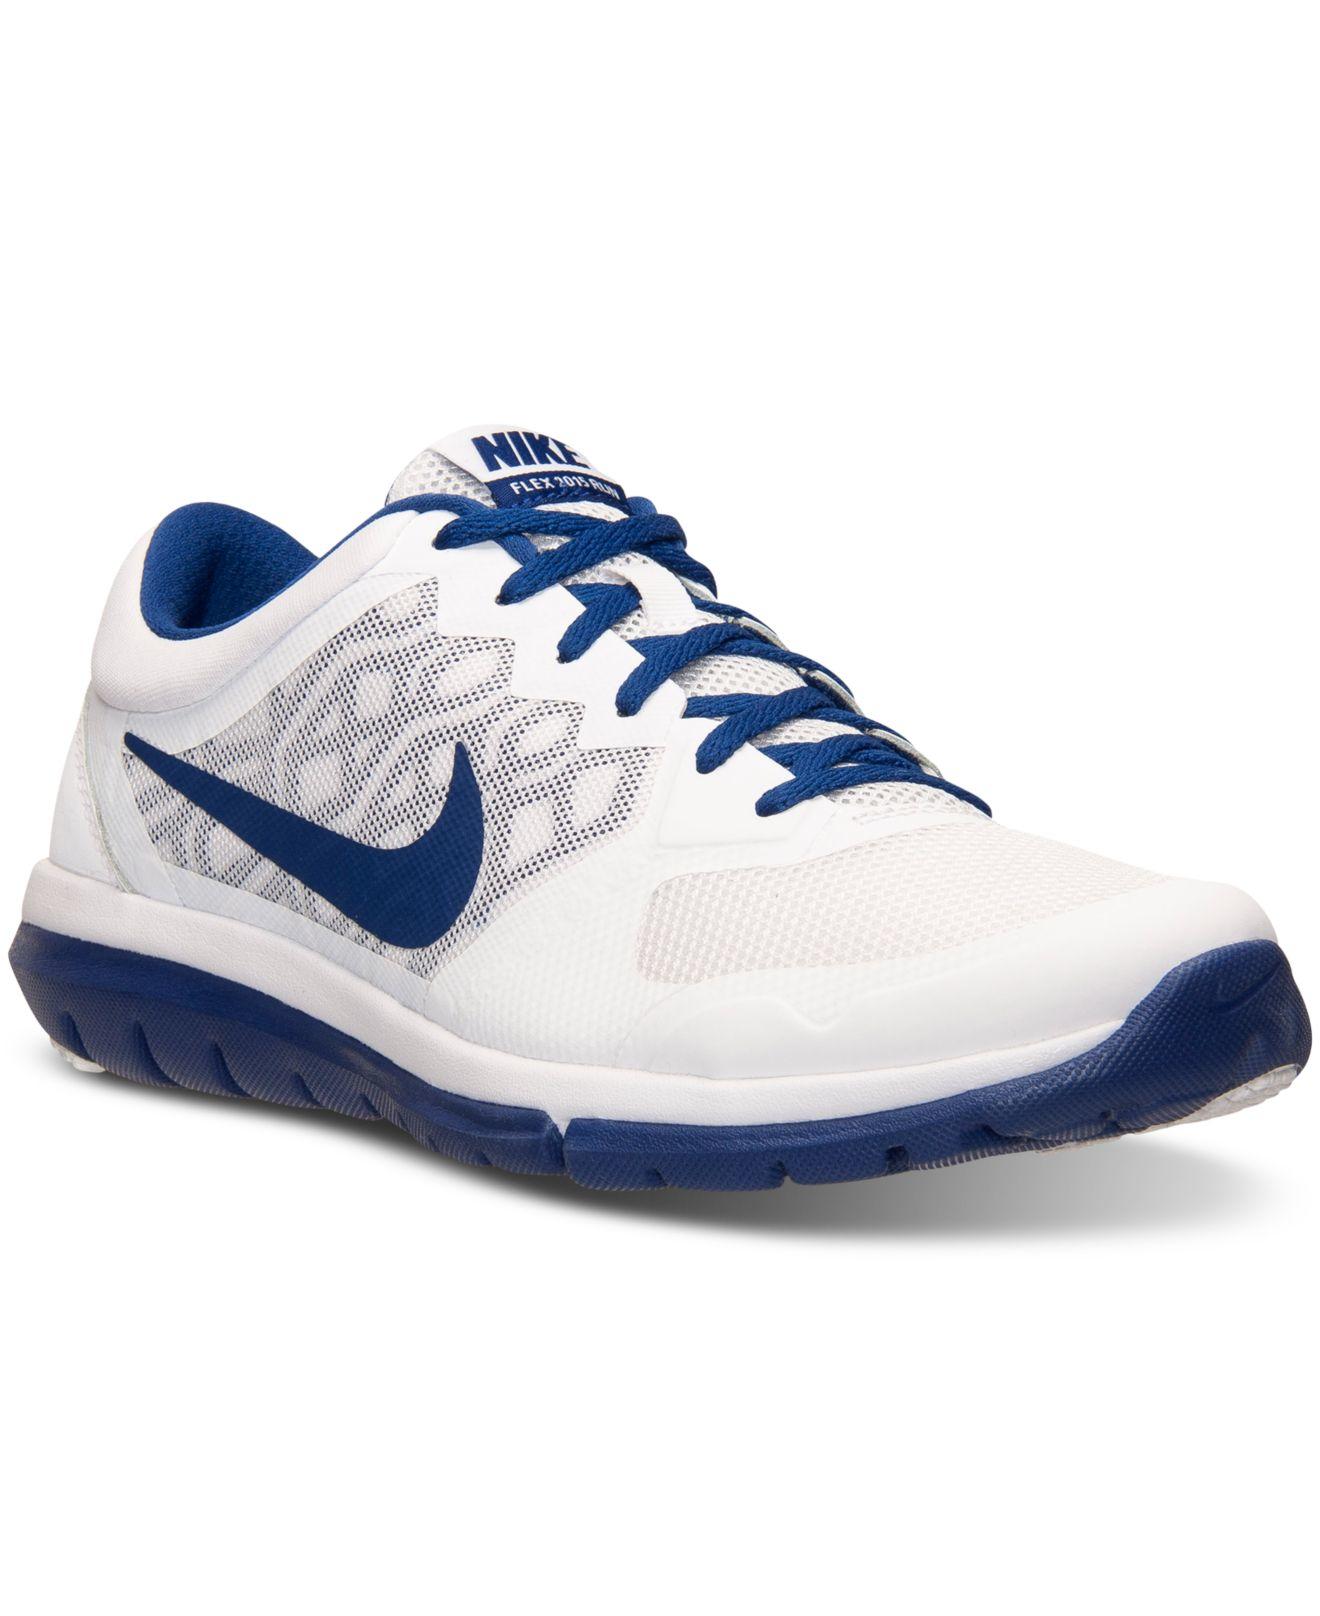 Lyst Nike Men S Flex Run 2015 Running Sneakers From